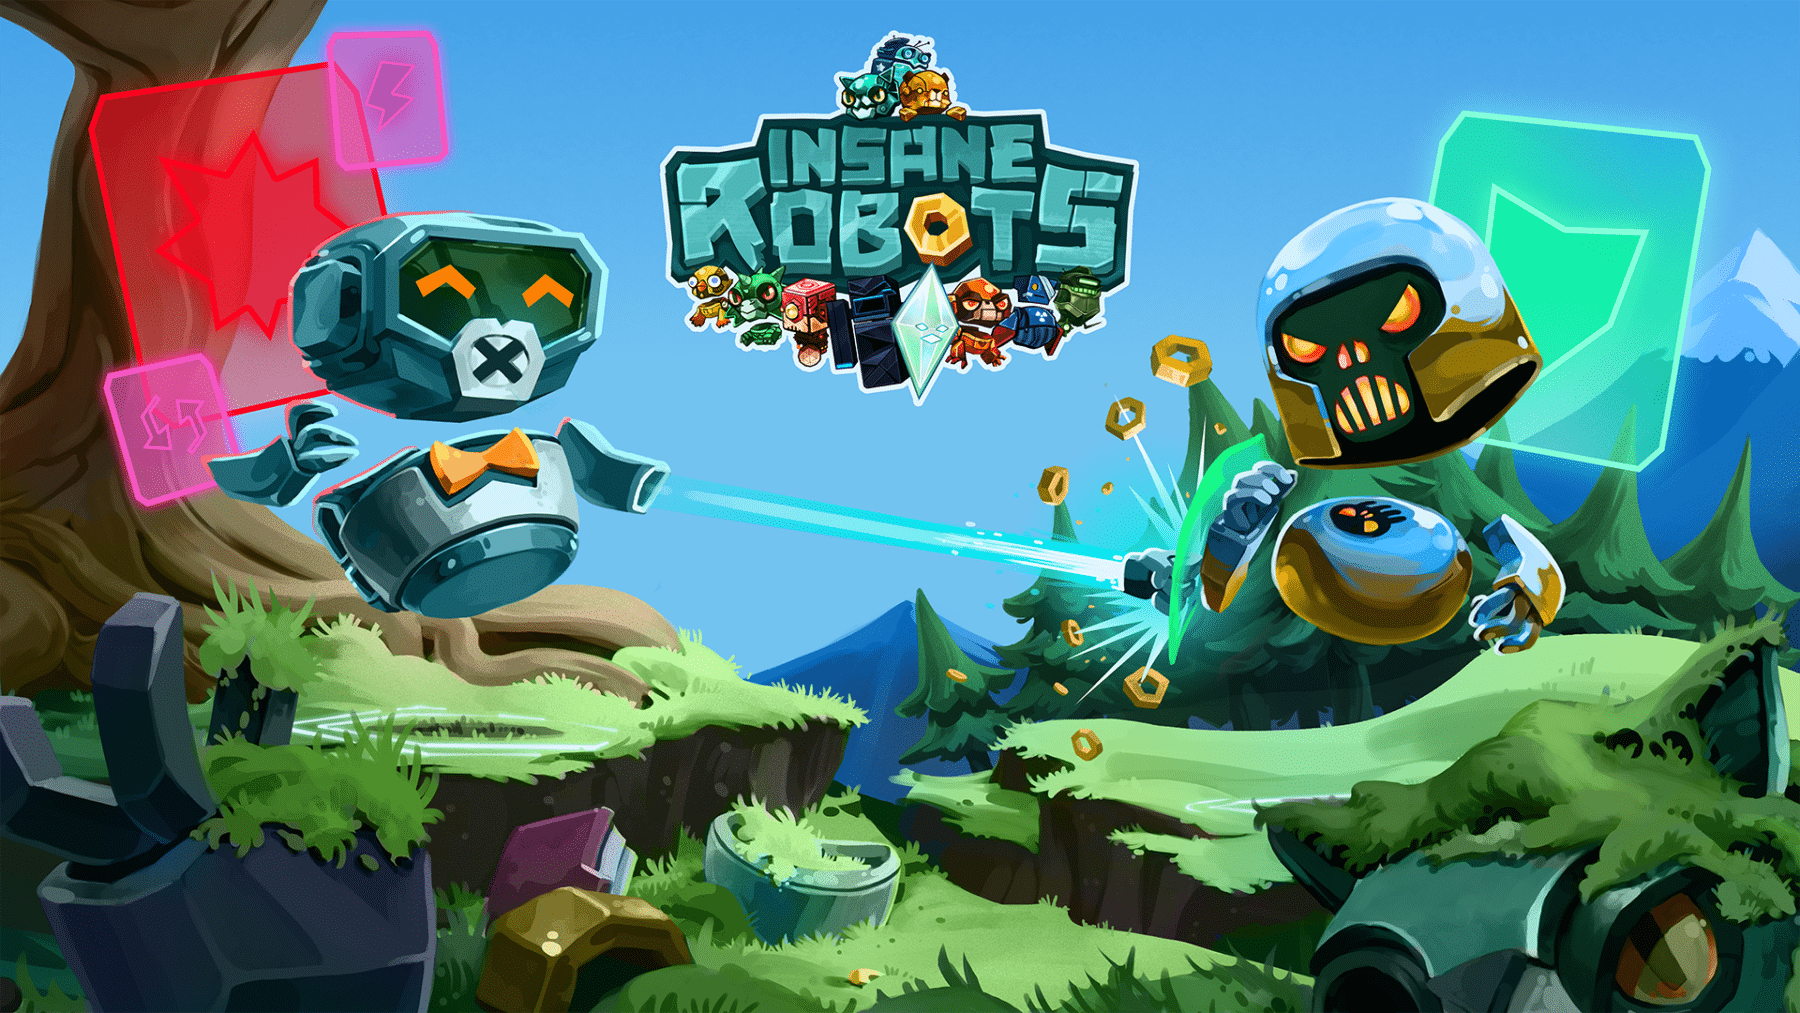 Crazy Card Battler Insane Robots ya disponible en Playstation 4